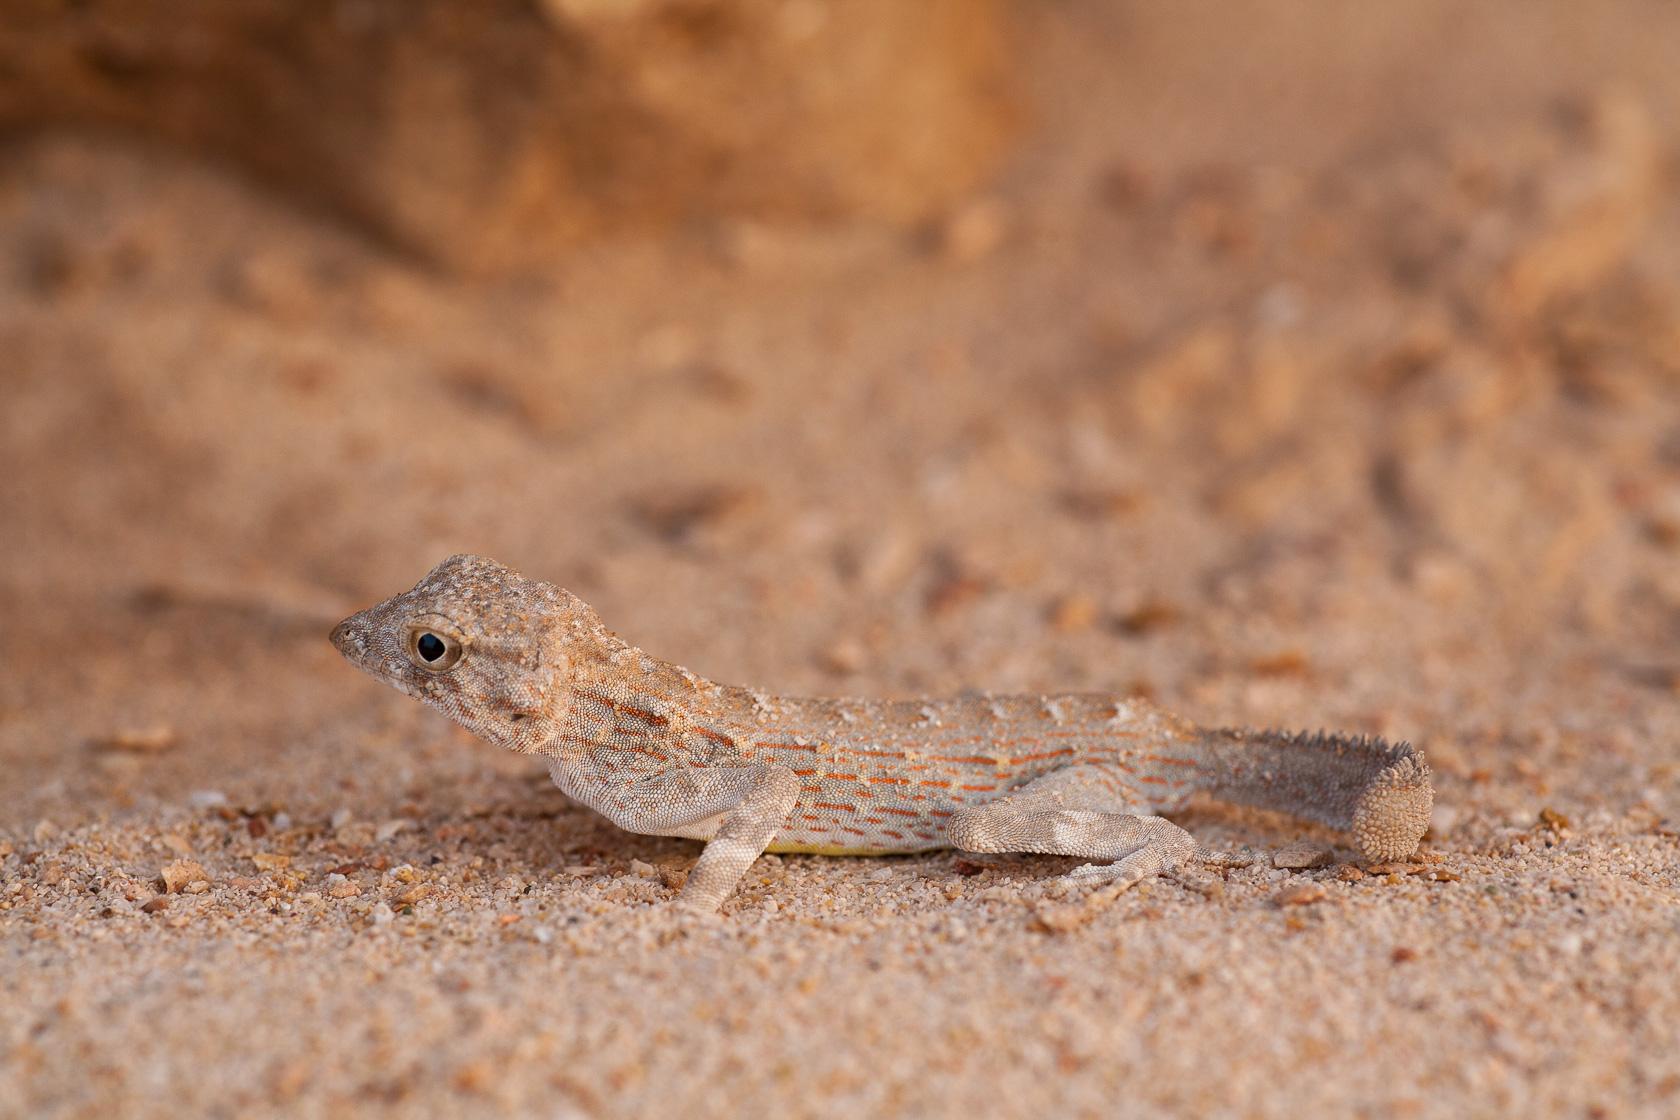 Gecko à queue de scorpion (Pristurus carter) à Oman